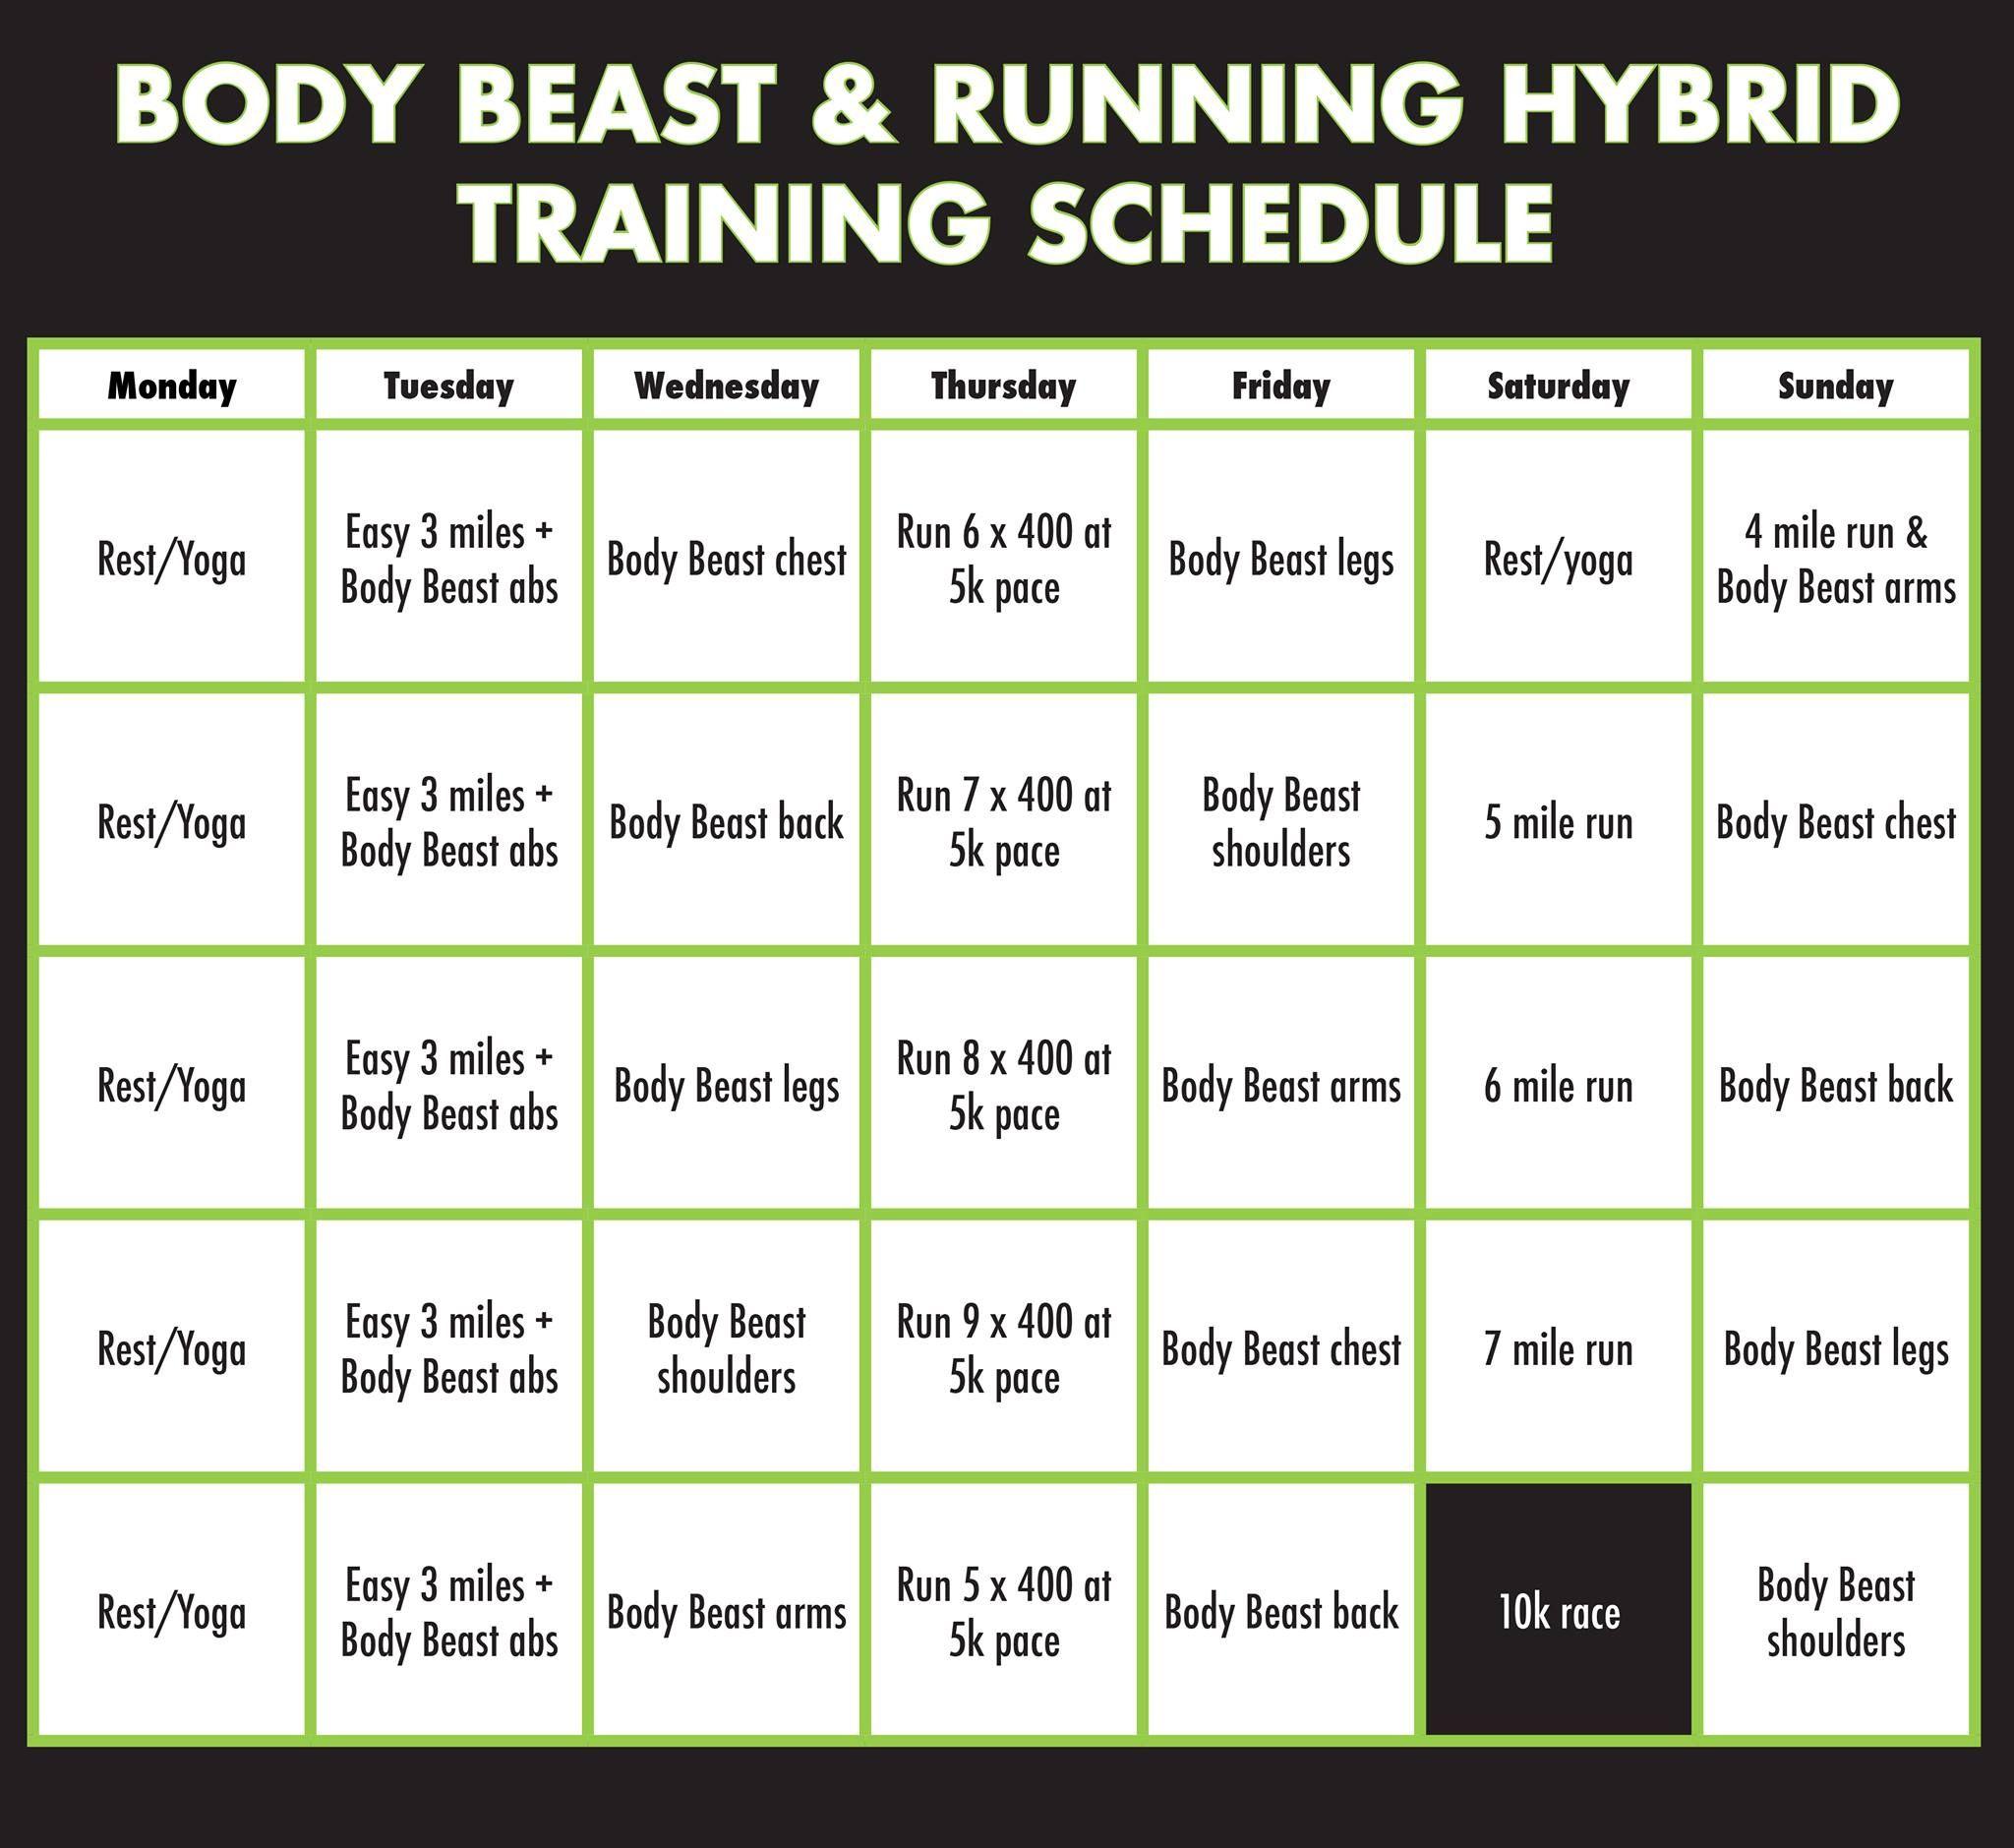 Body Beast + Running Hybrid Training Schedule | Body Beast throughout Body Beast Hybrid Calendar